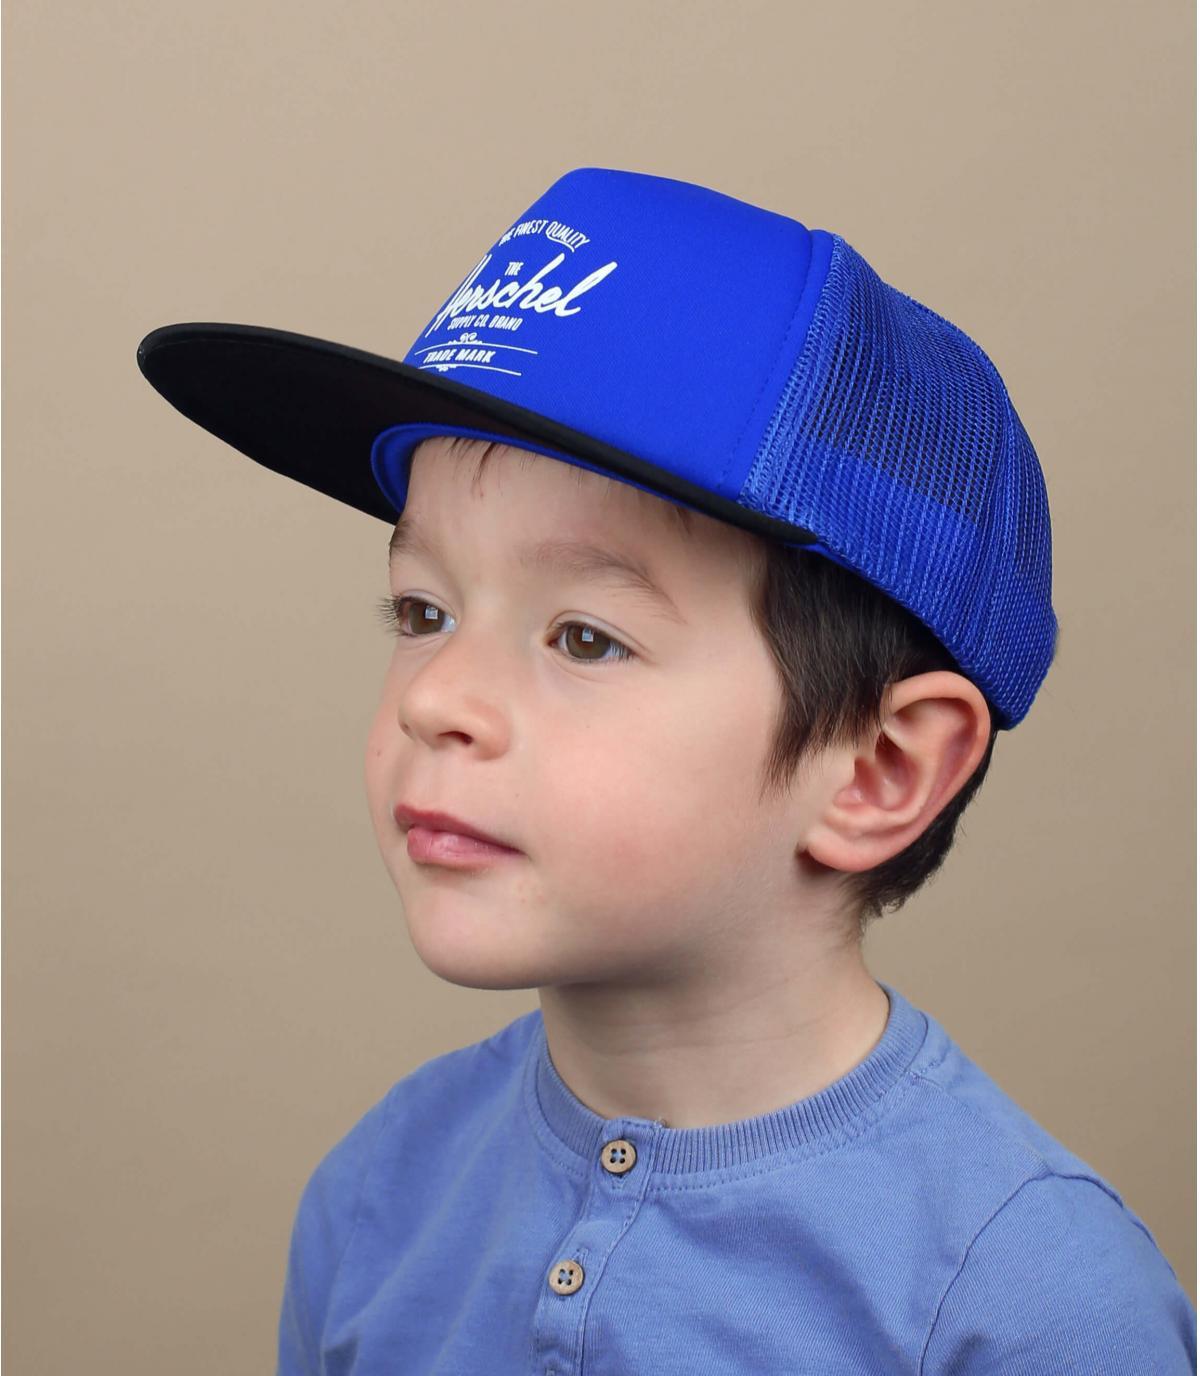 cappellino bambino Herschel riflettente